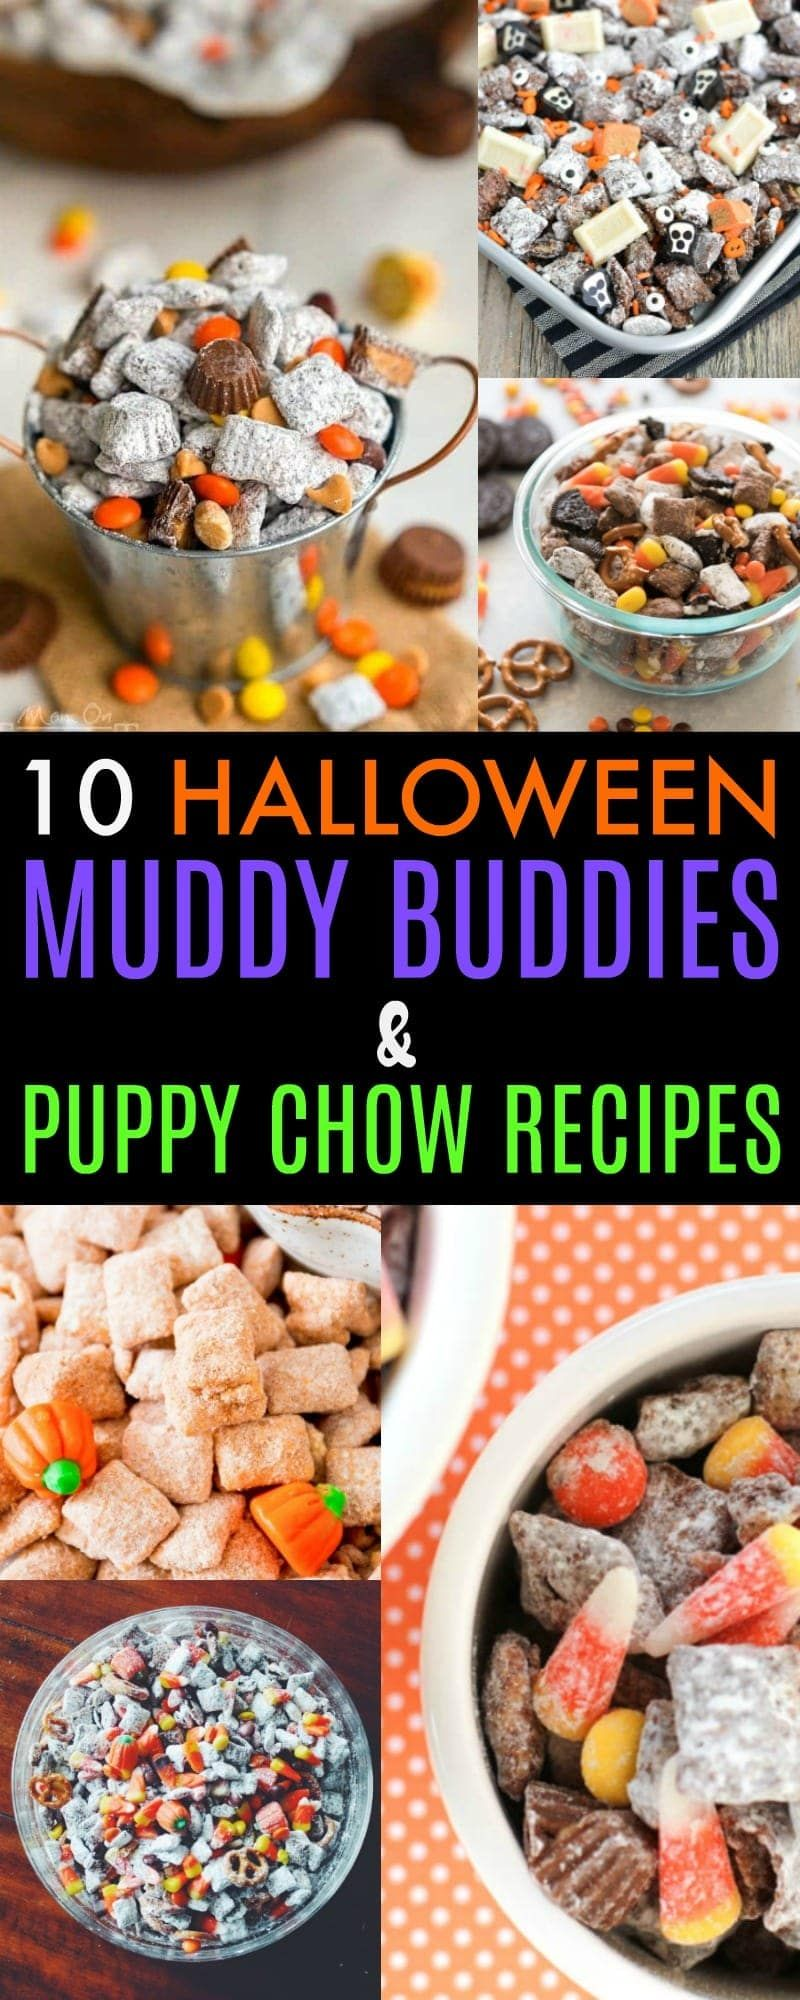 10 Halloween Muddy Buddies and Puppy Chow Recipes